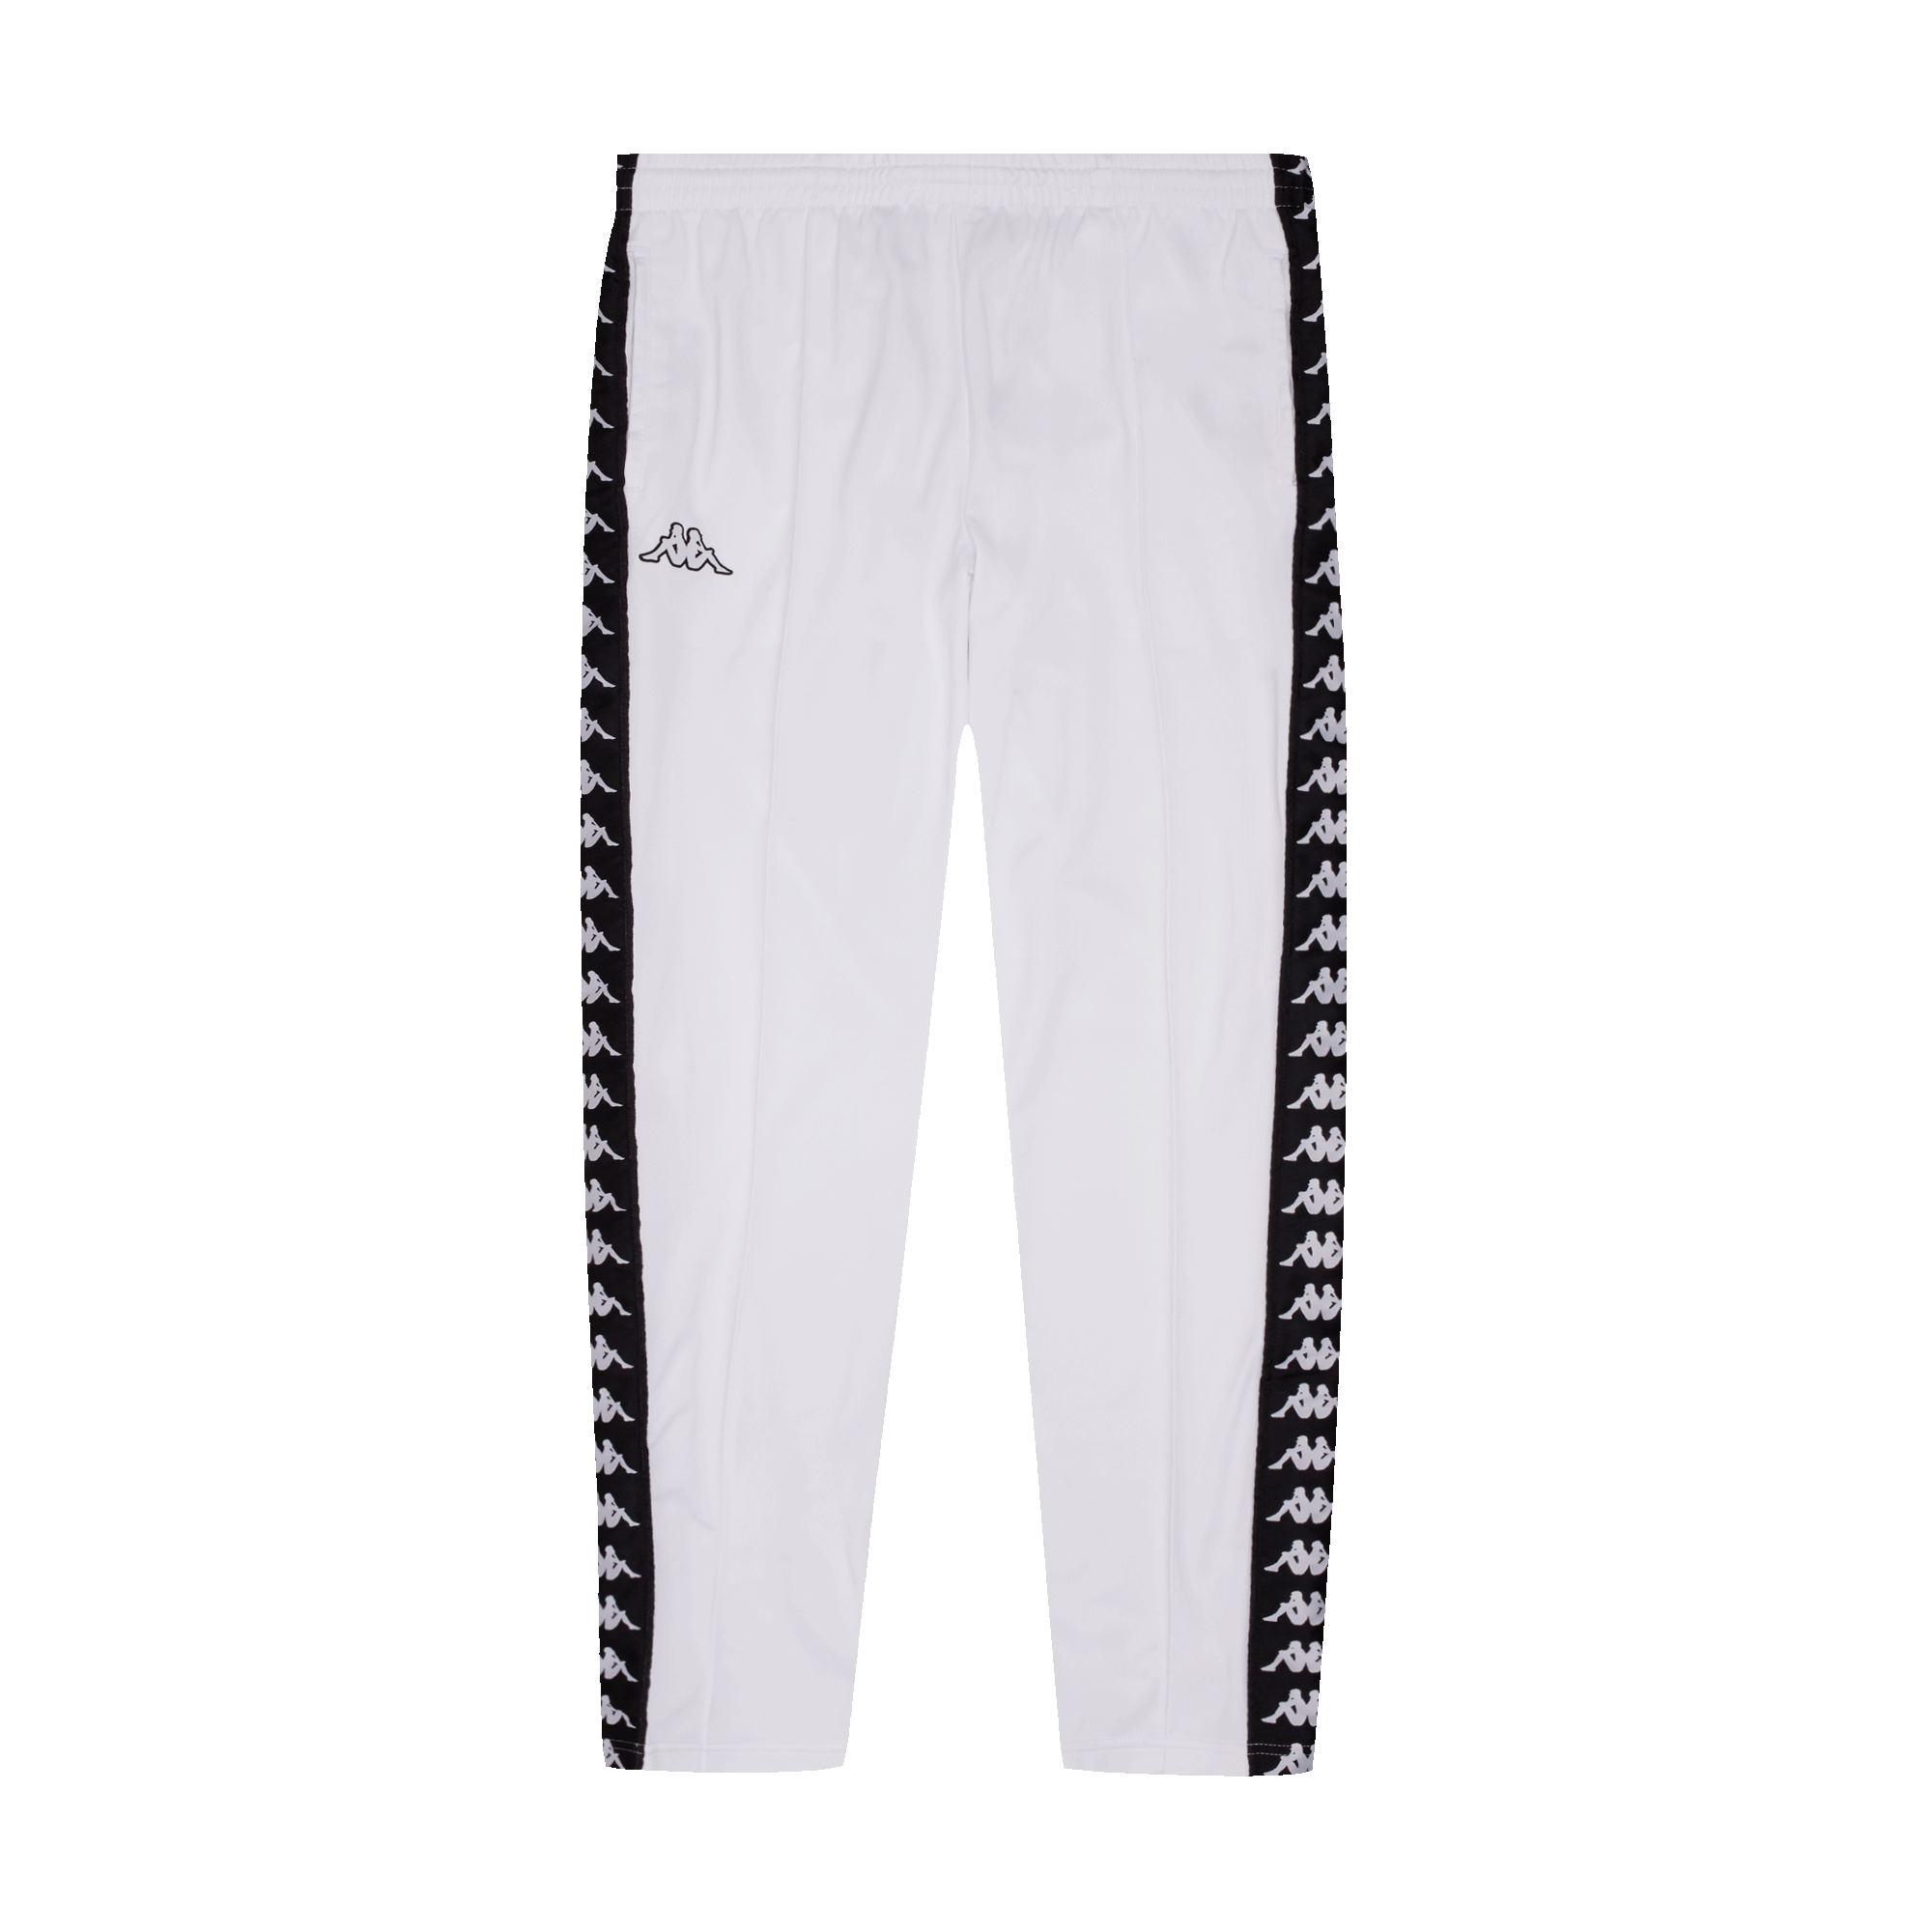 b81b3a25 Kappa Banda Astoria Snaps Slim Pant white / black - Pantaloni ...